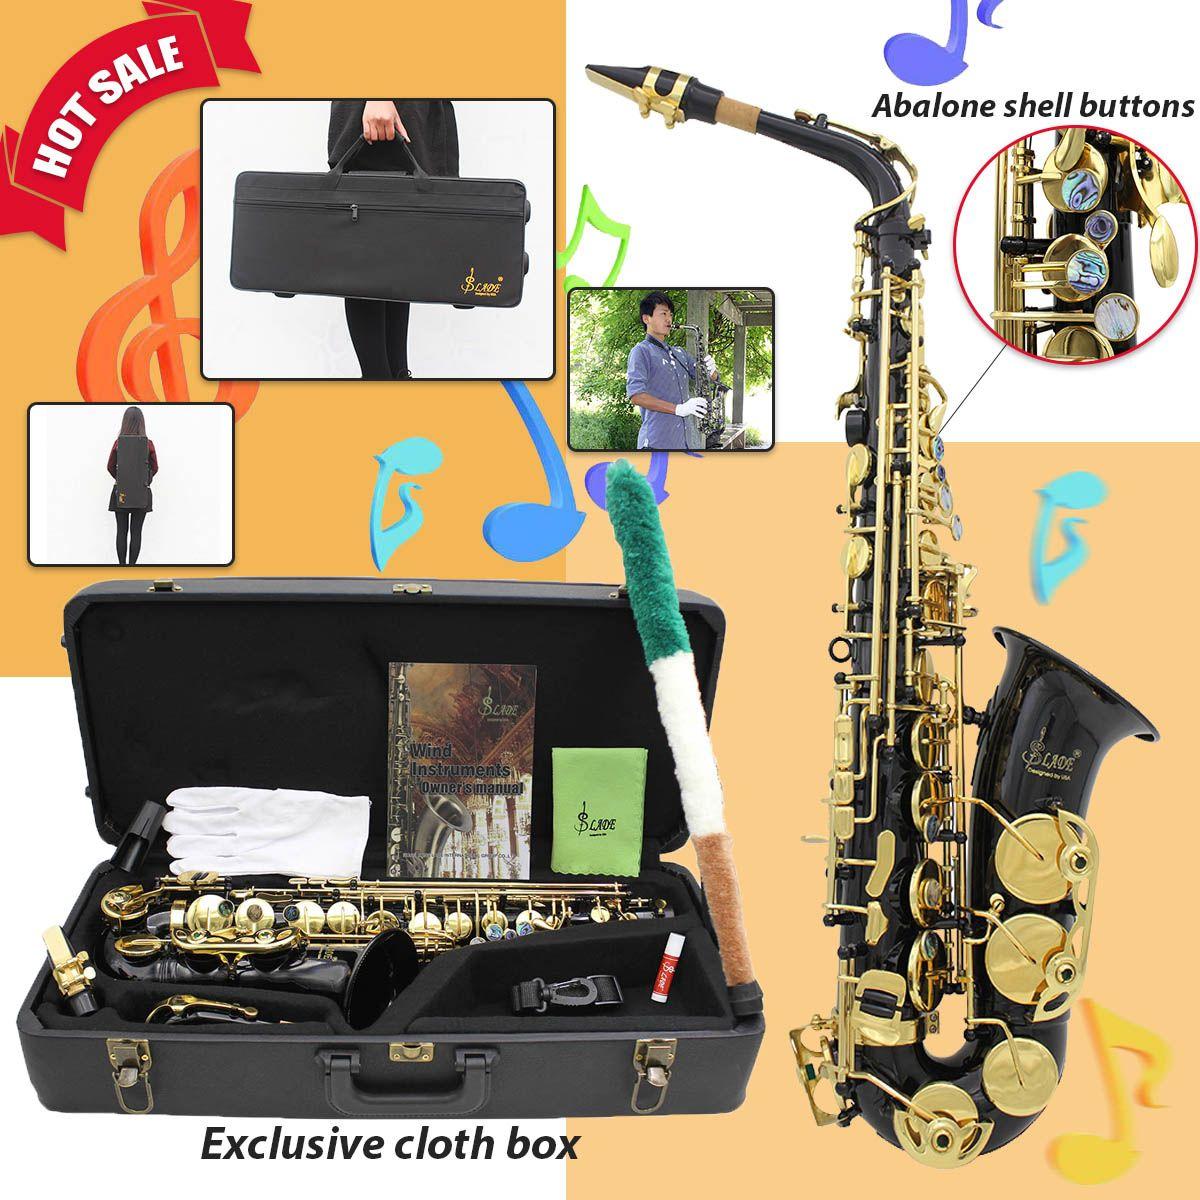 Messing Gravierte Eb E-Flache Alto Saxophon Sax Abalone Shell Tasten Mit Fall Handschuhe Reinigung Tuch Gürtel Pinsel